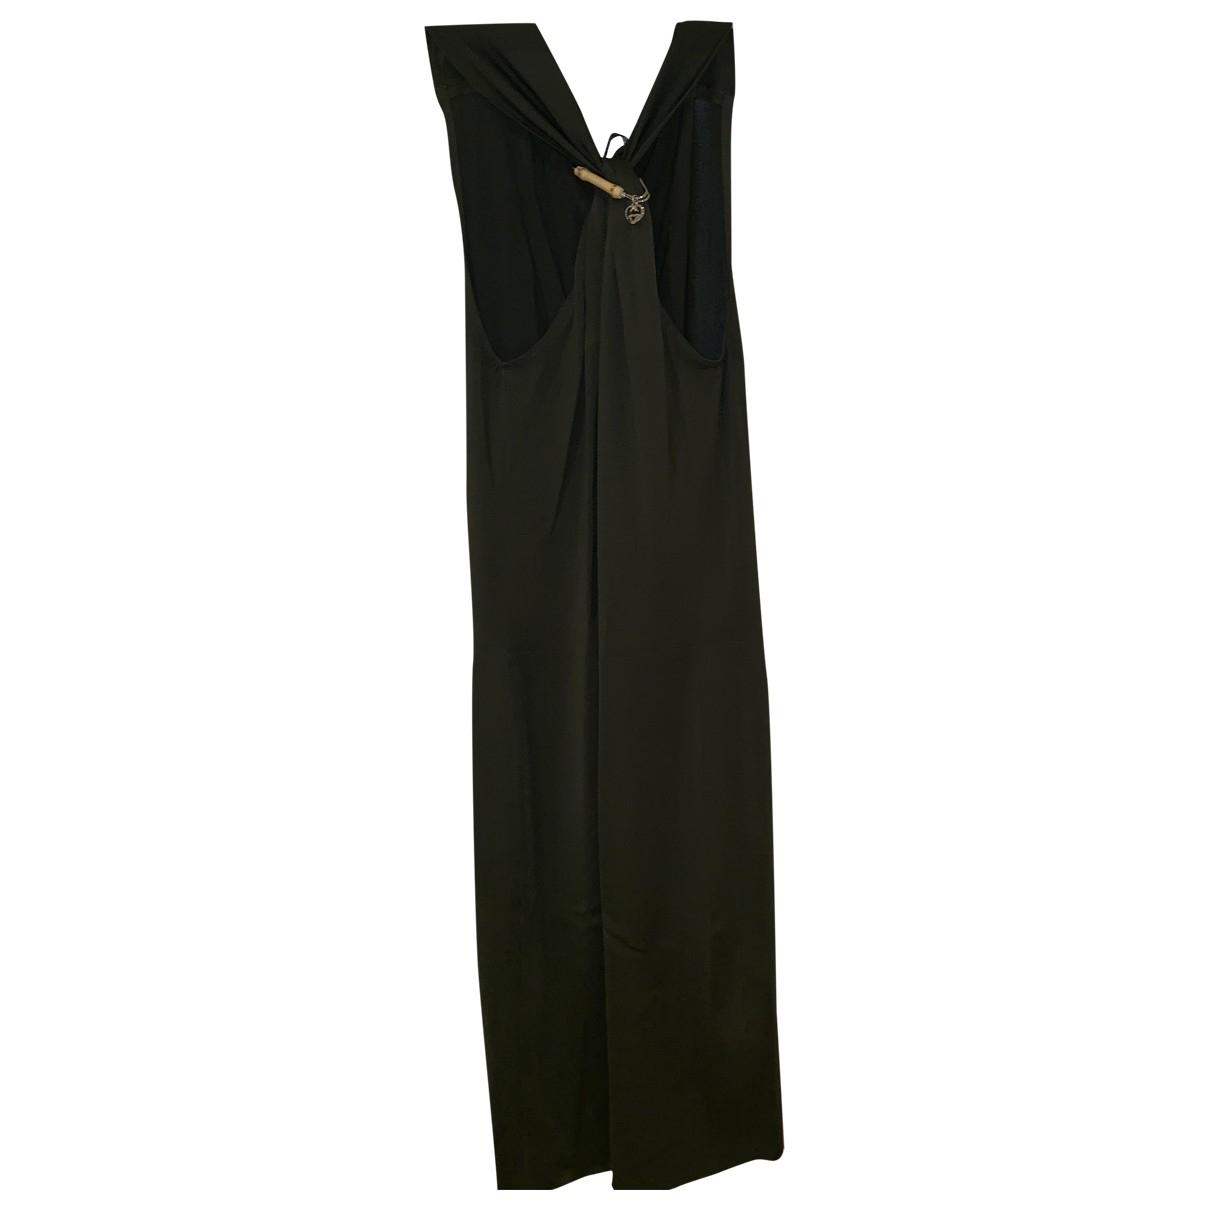 Gucci - Robe   pour femme en coton - elasthane - vert